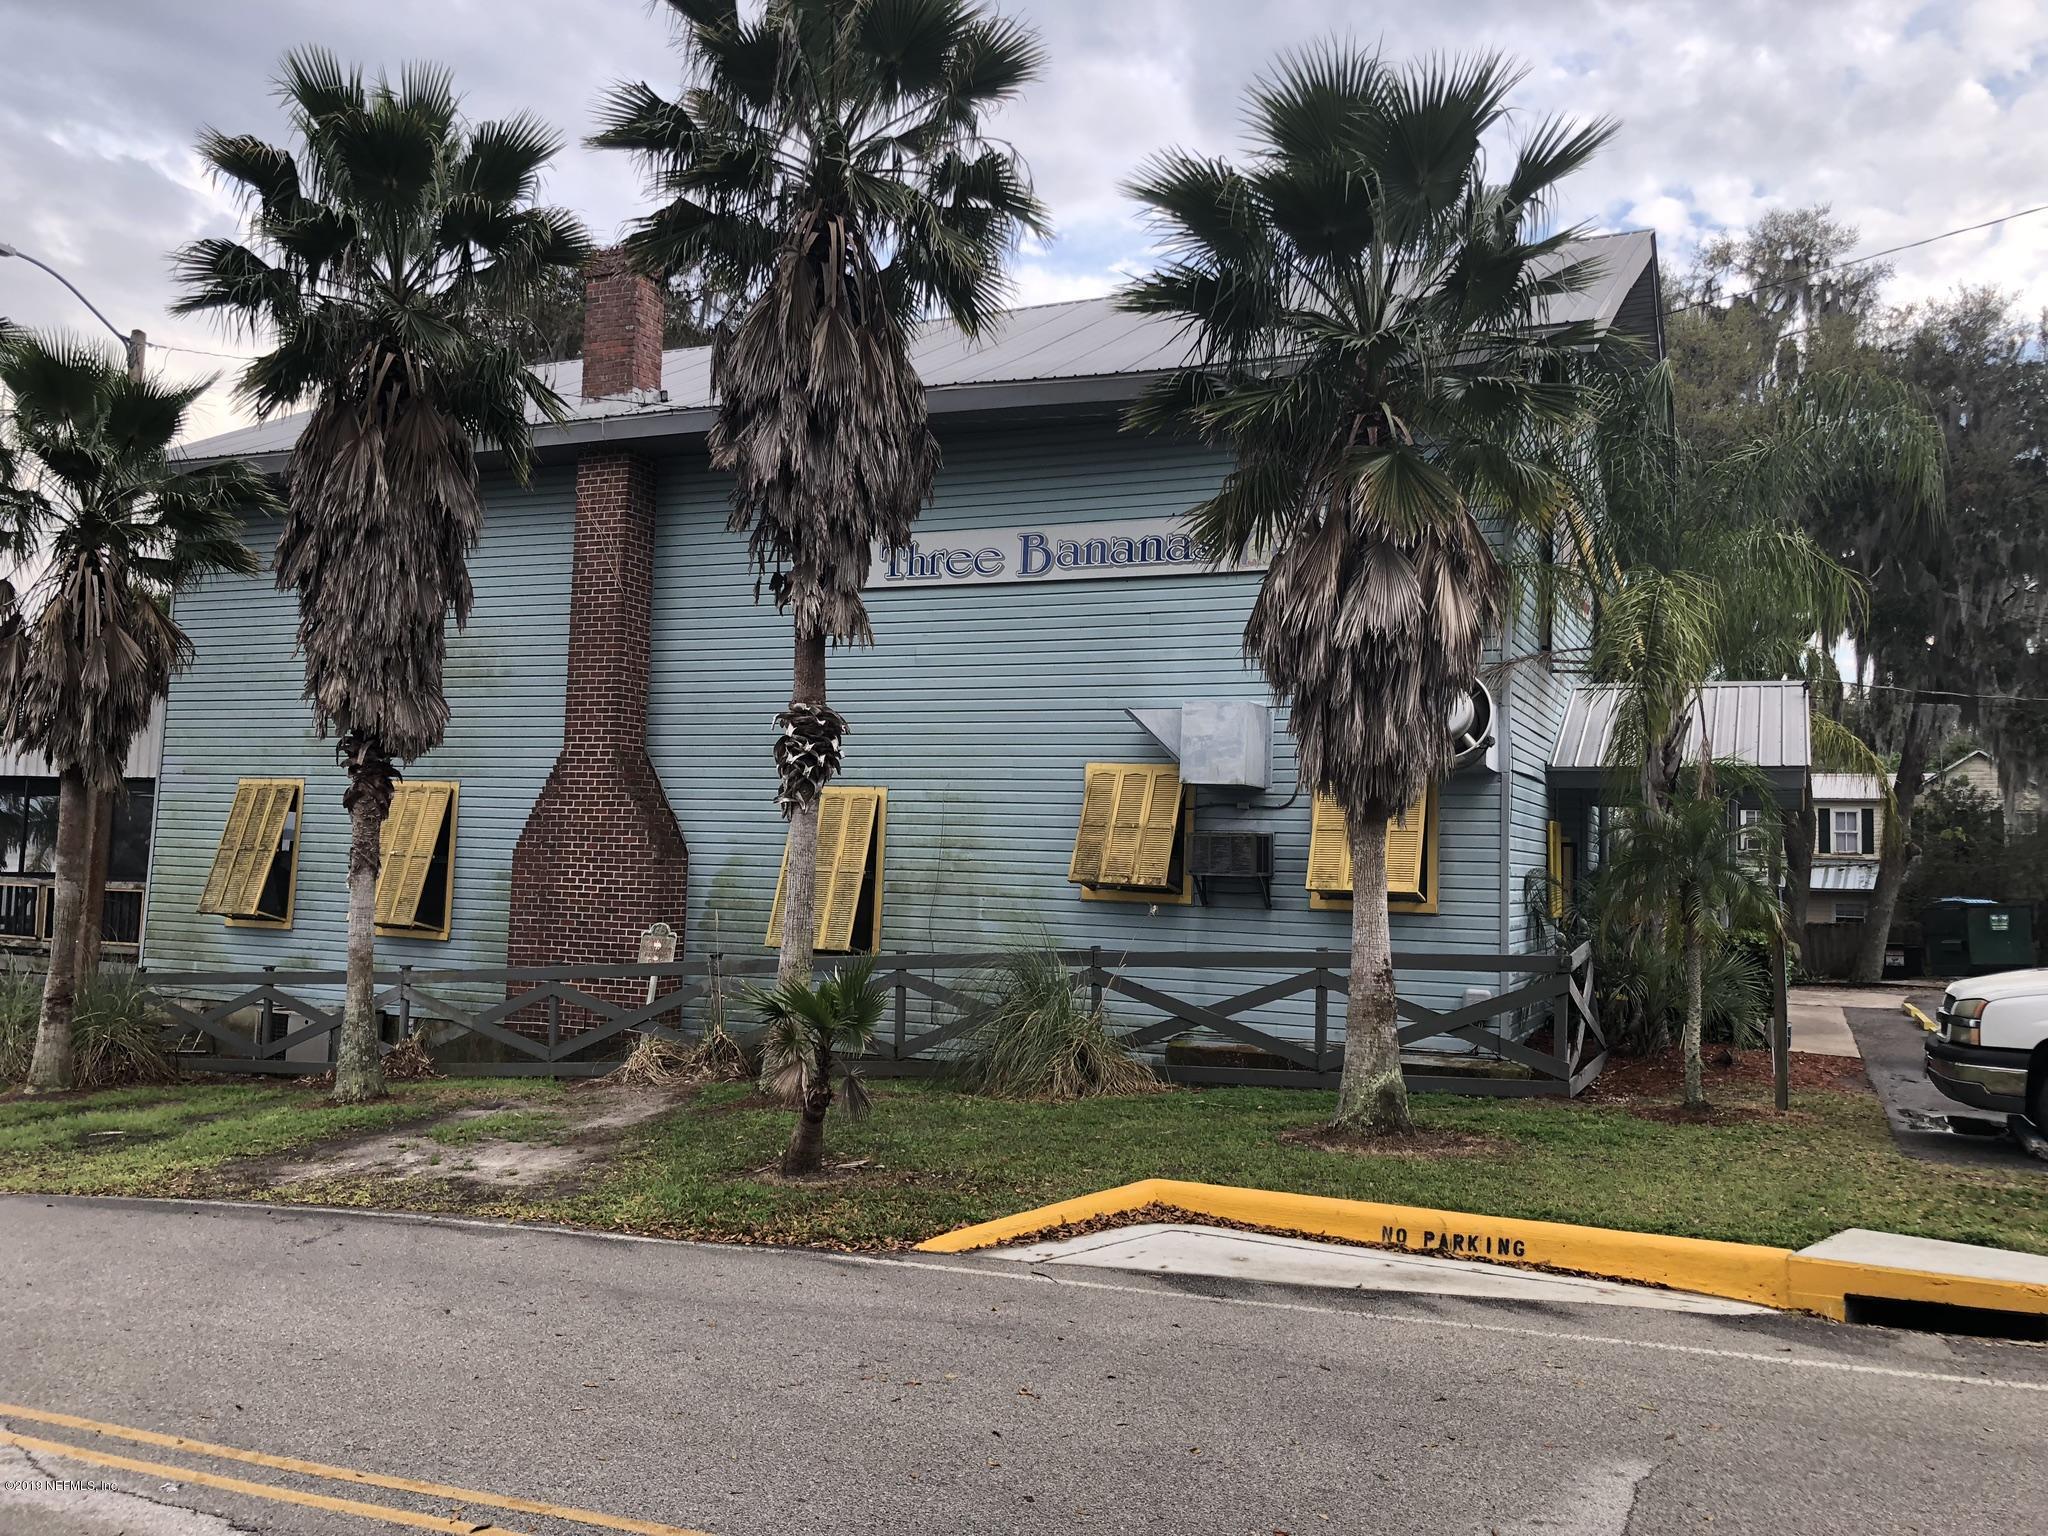 0 WALNUT, CRESCENT CITY, FLORIDA 32112, ,Vacant land,For sale,WALNUT,1041701